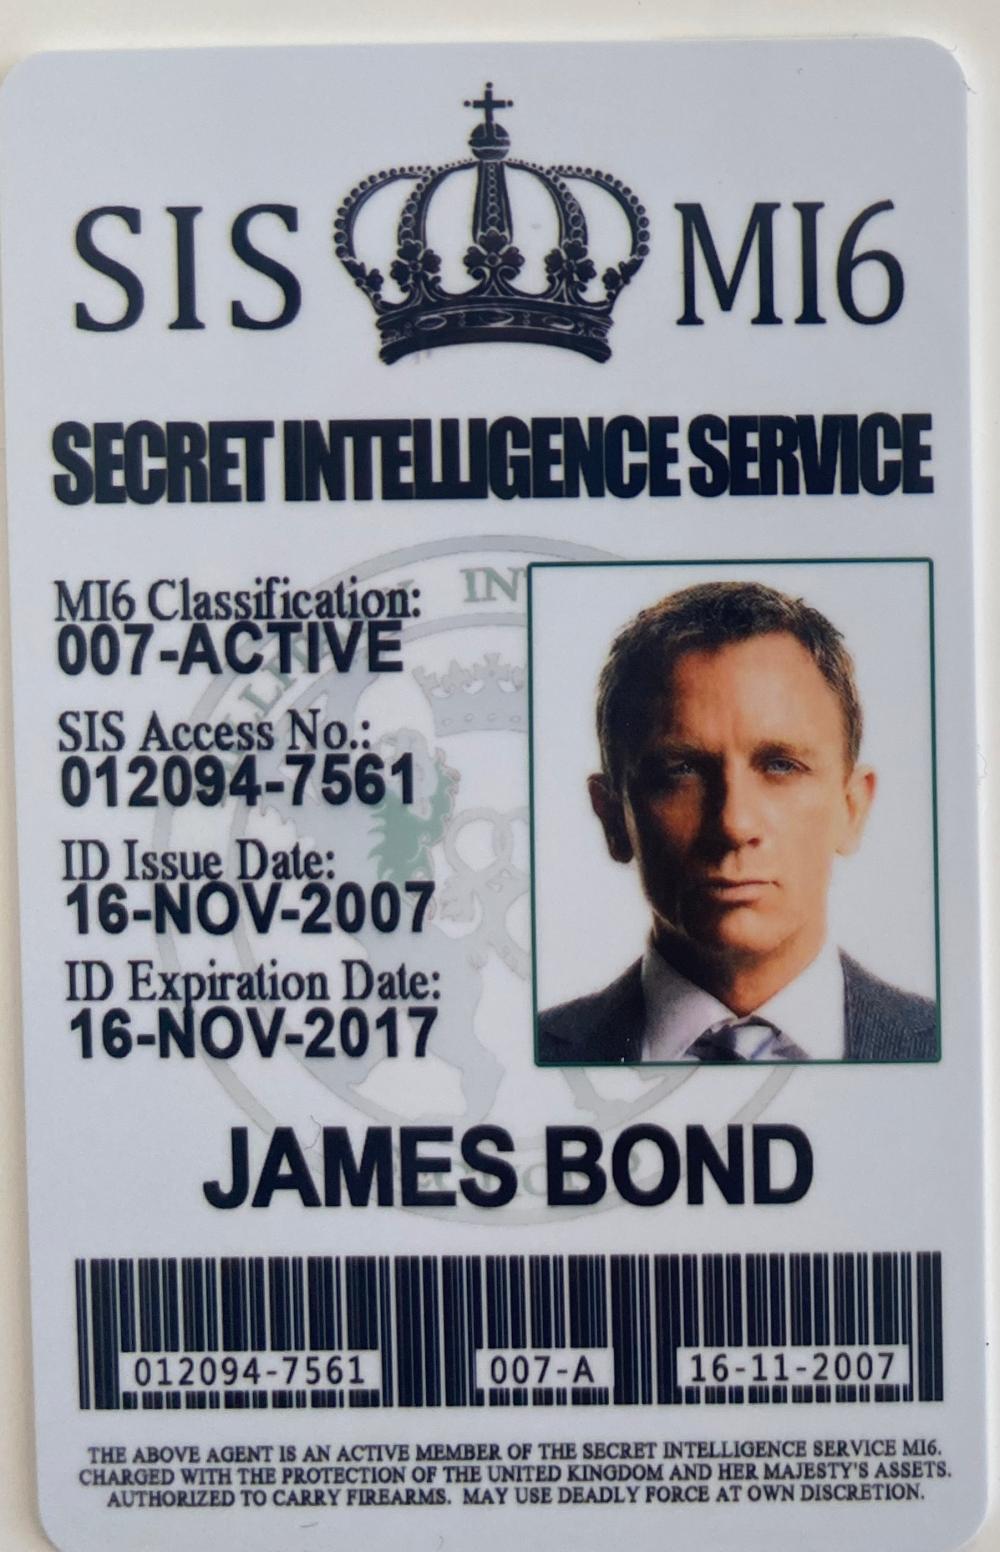 James Bond Casino Royale Secret Intelligence Service ID prop